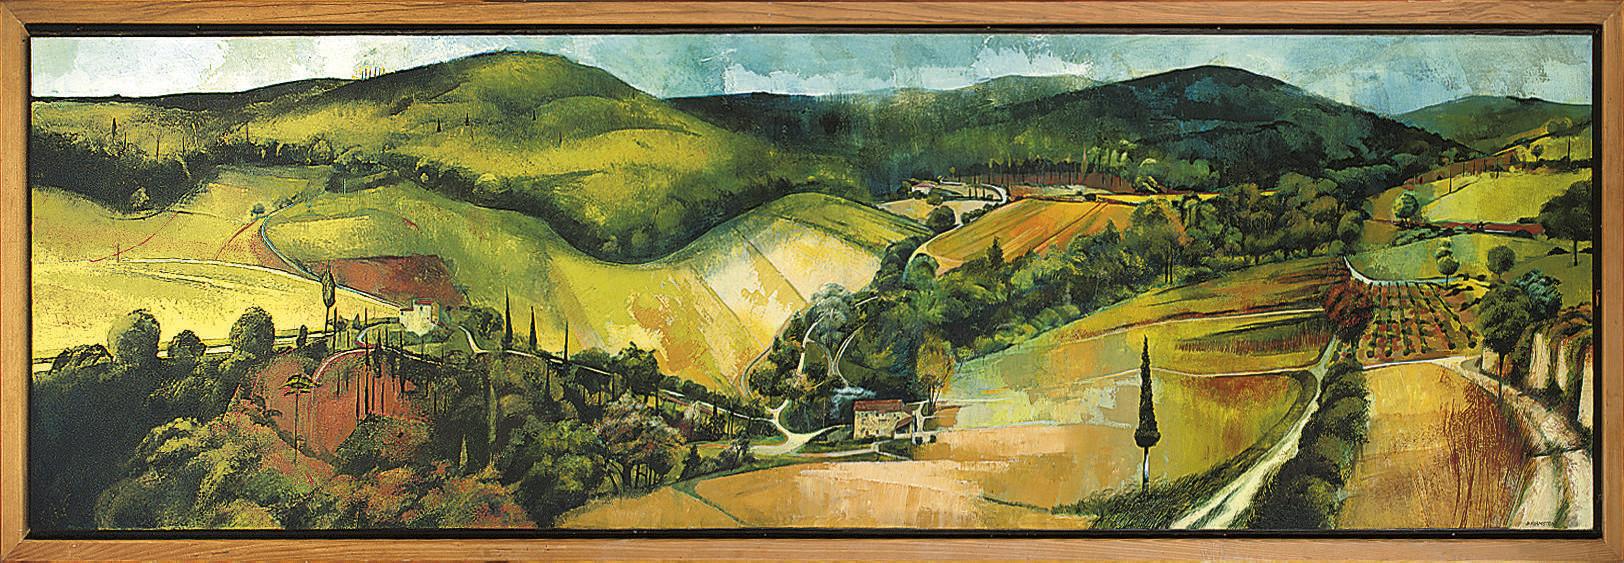 David Firmstone, R.W.S. (b. 19